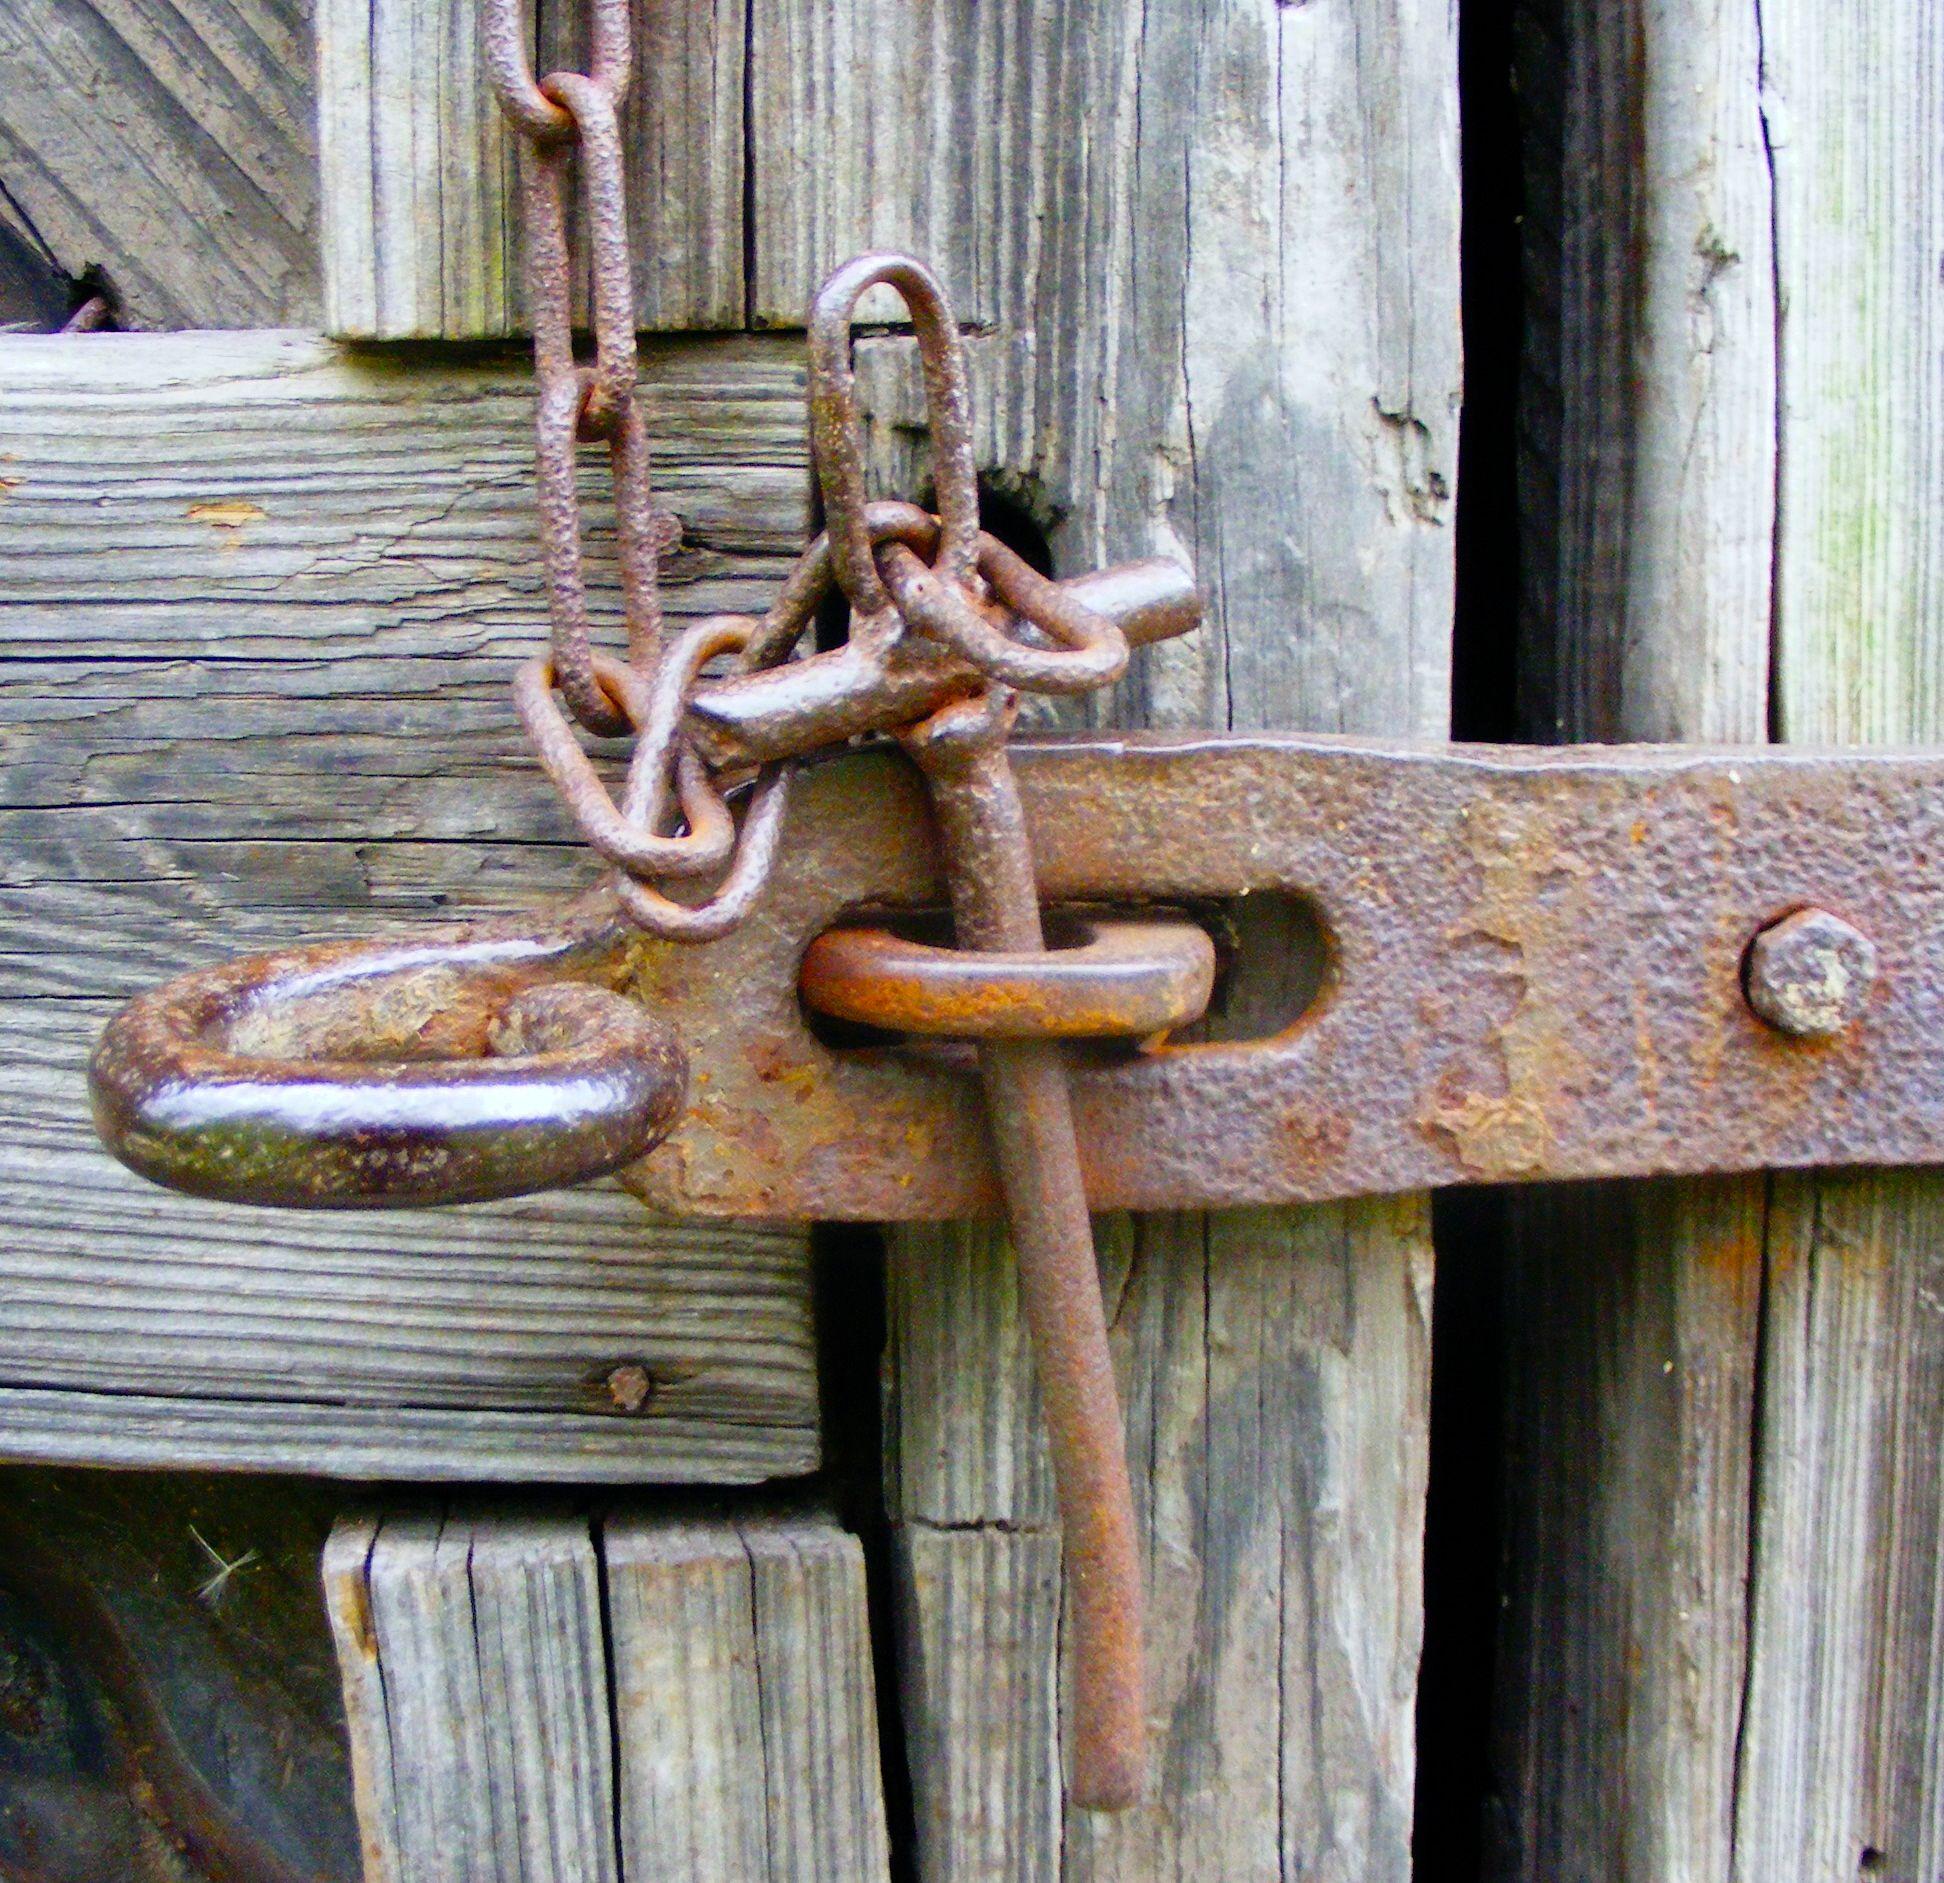 Rust Rusty Rustic Rusted Lock Door Barn Key Cerraduras